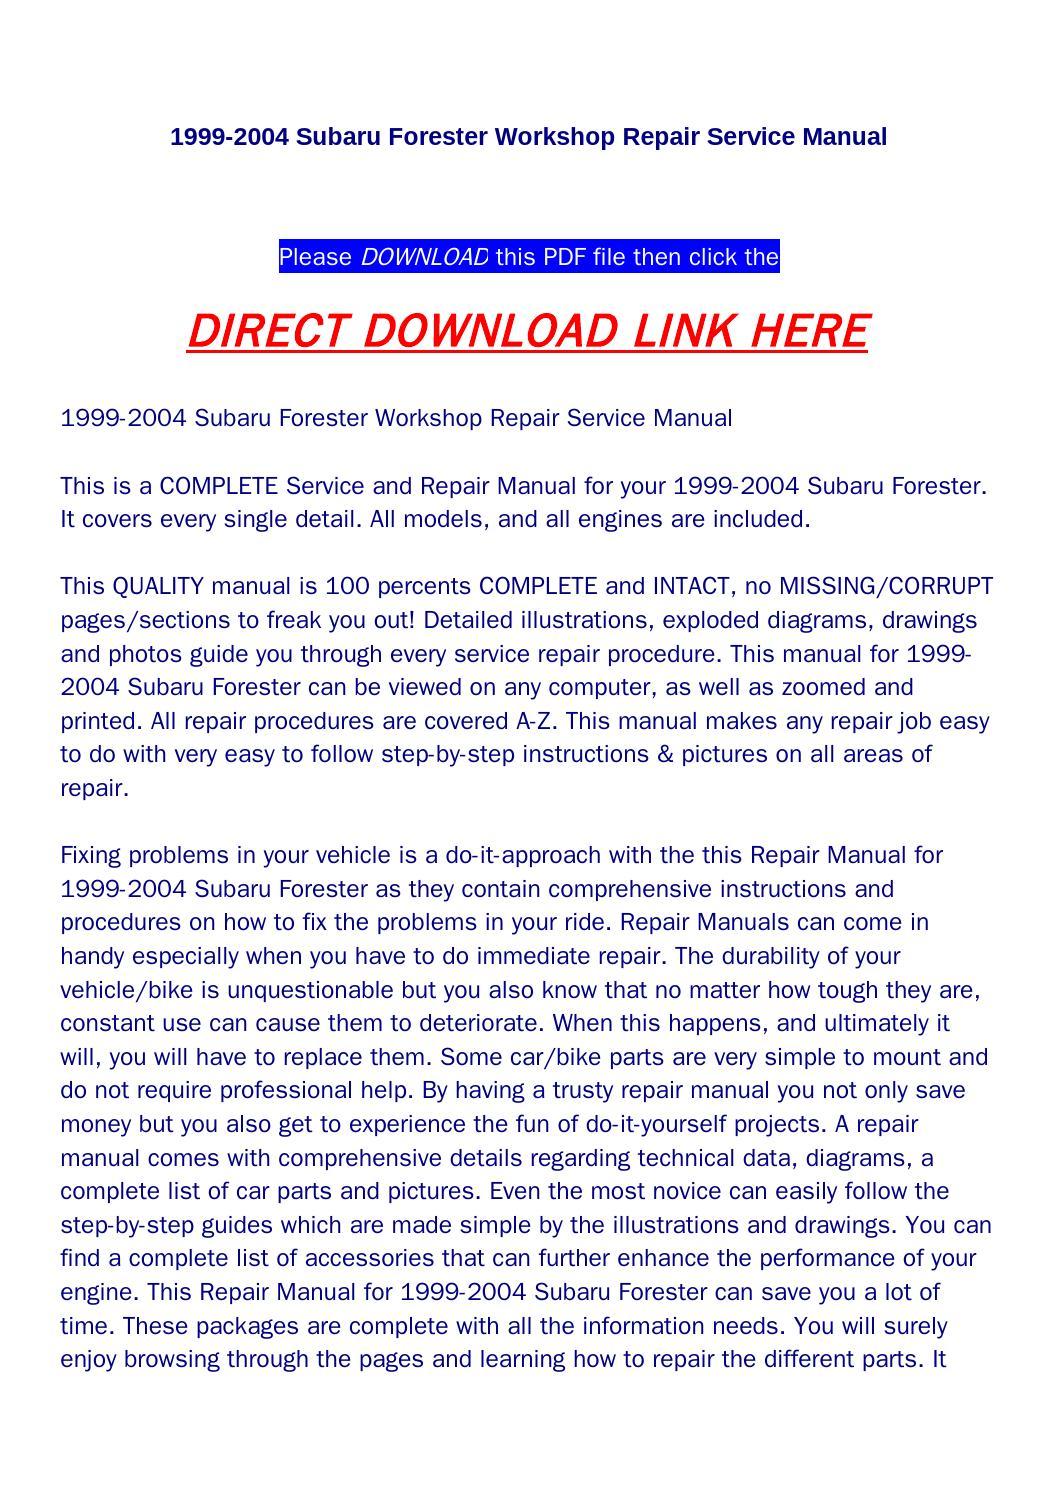 1999 subaru forester service manual